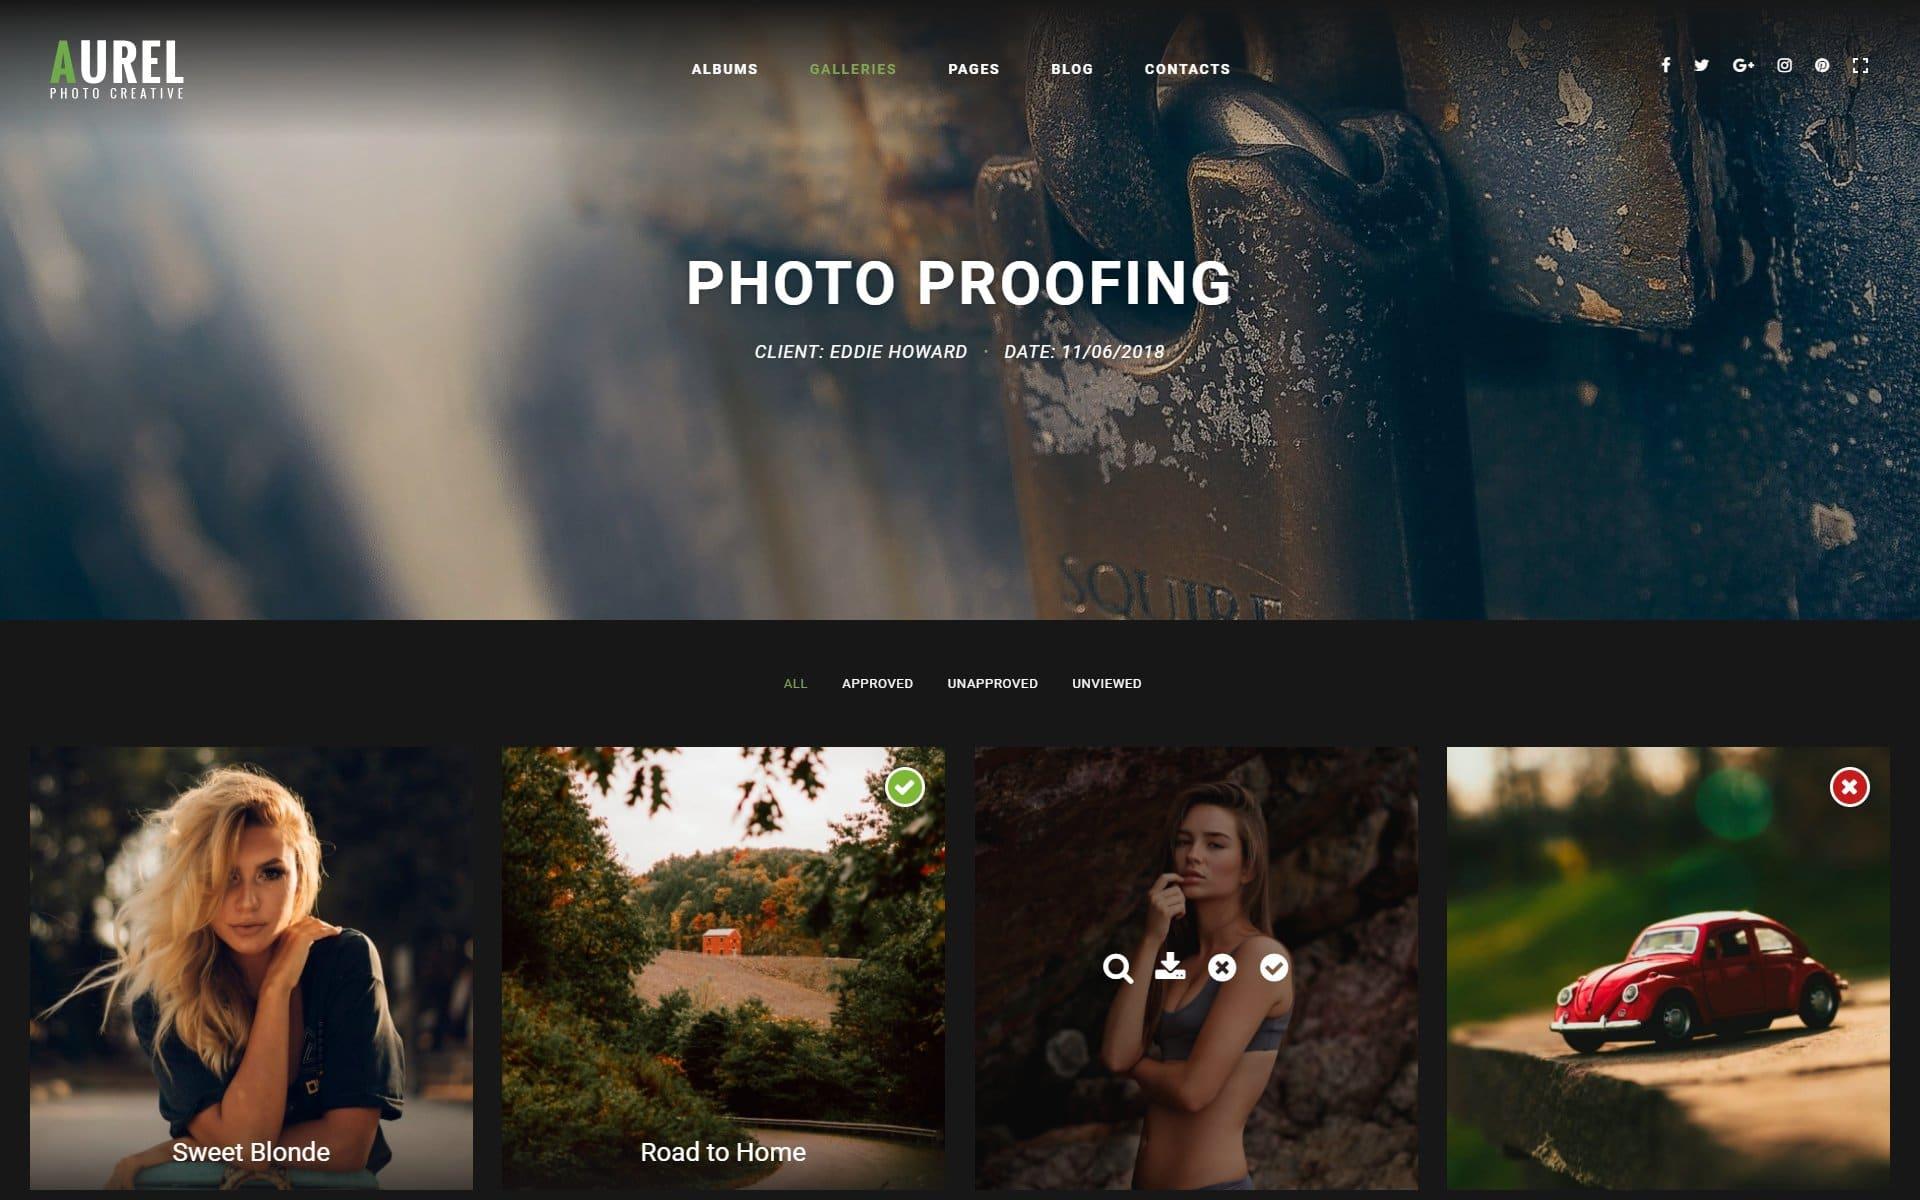 aurel photo proofing